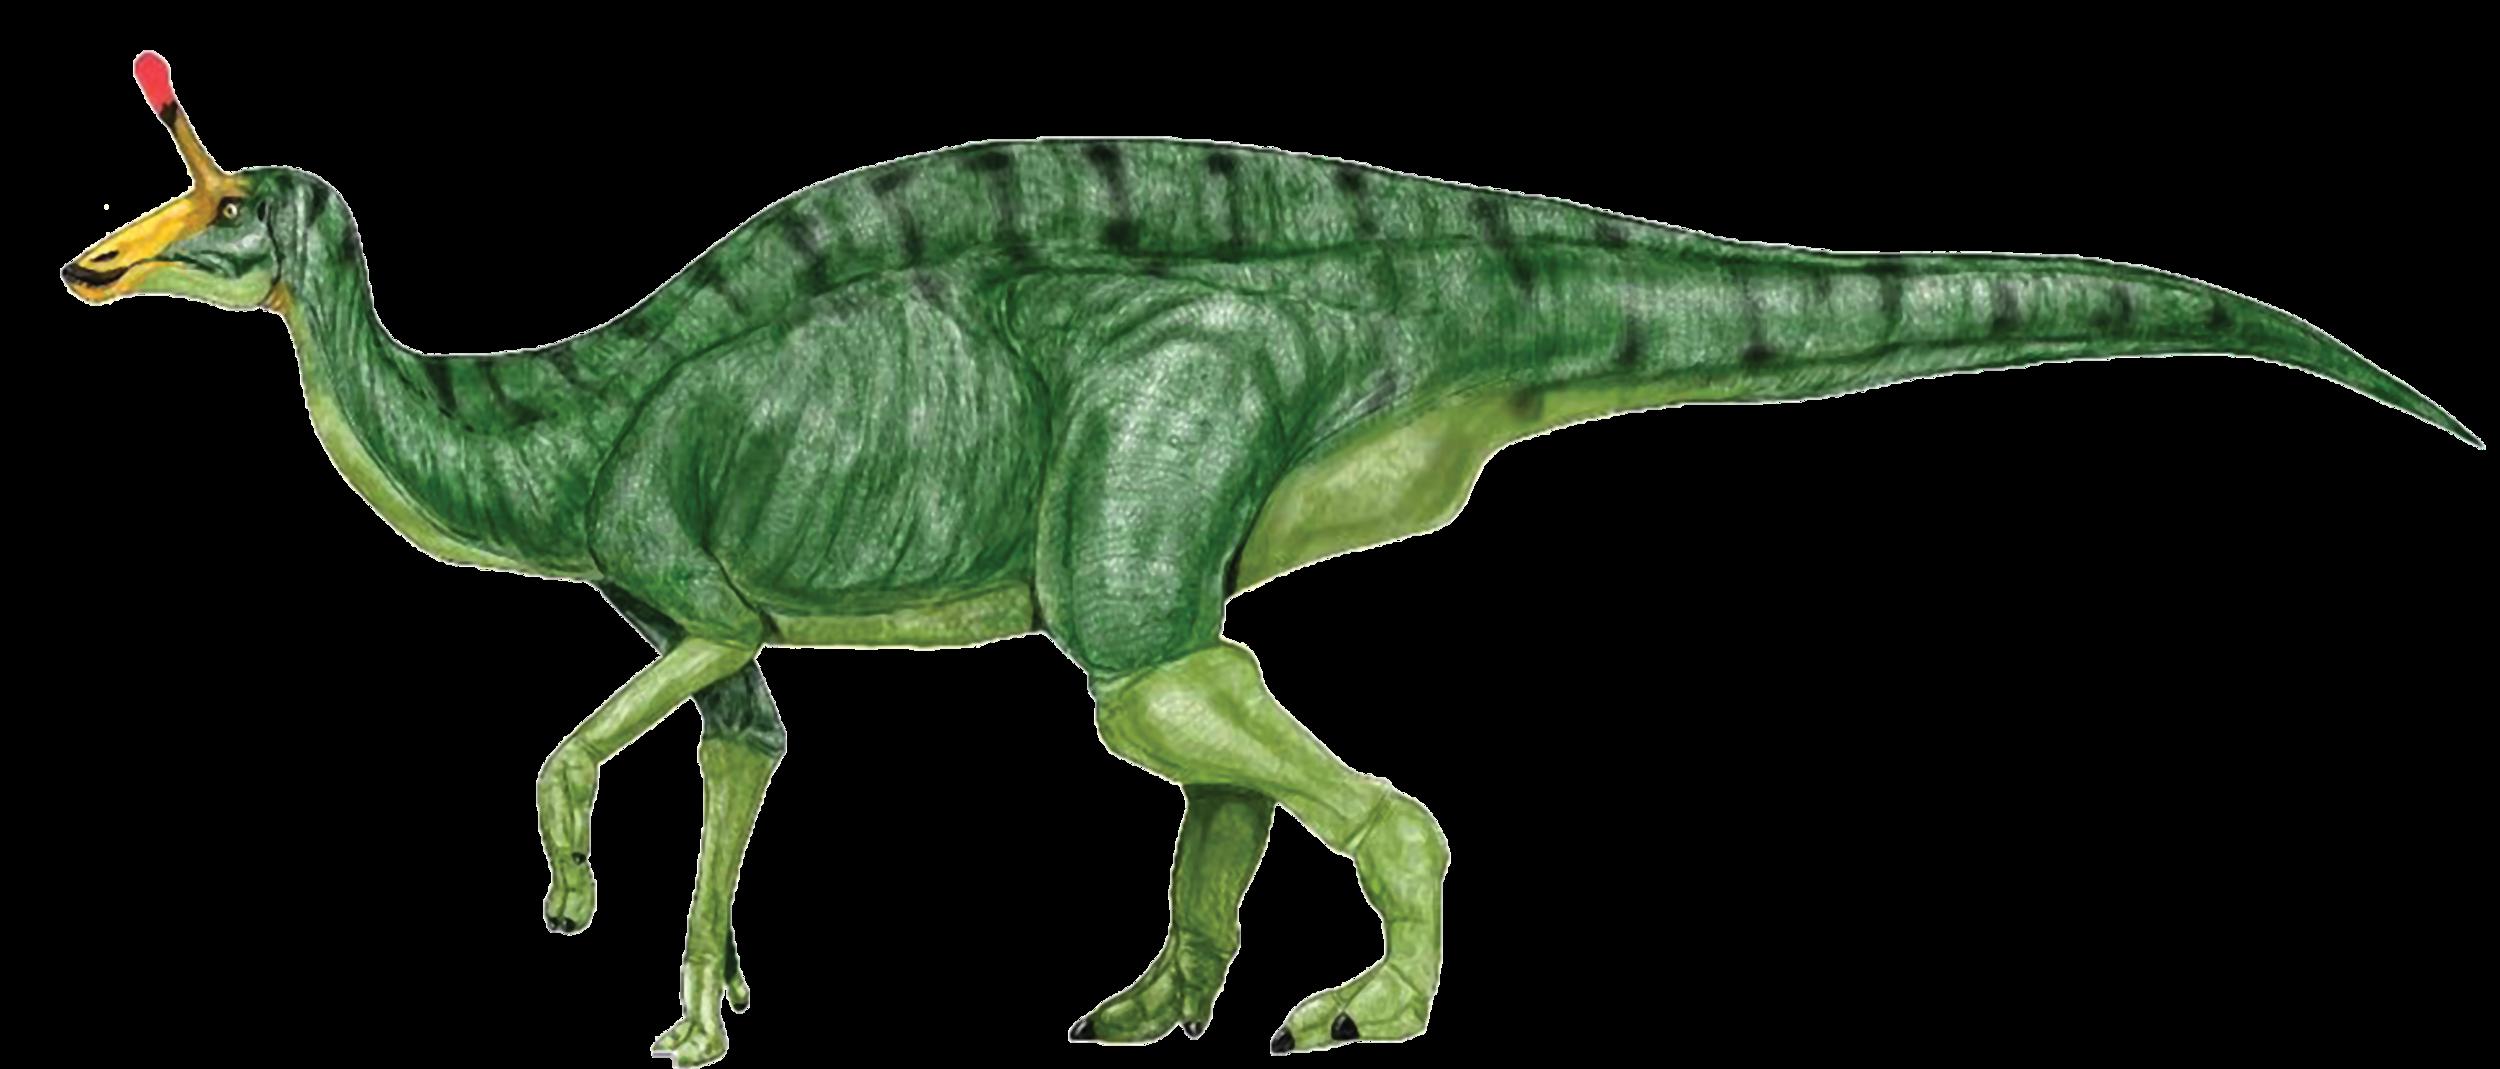 Green-dinosaur-clipart-image-8.png